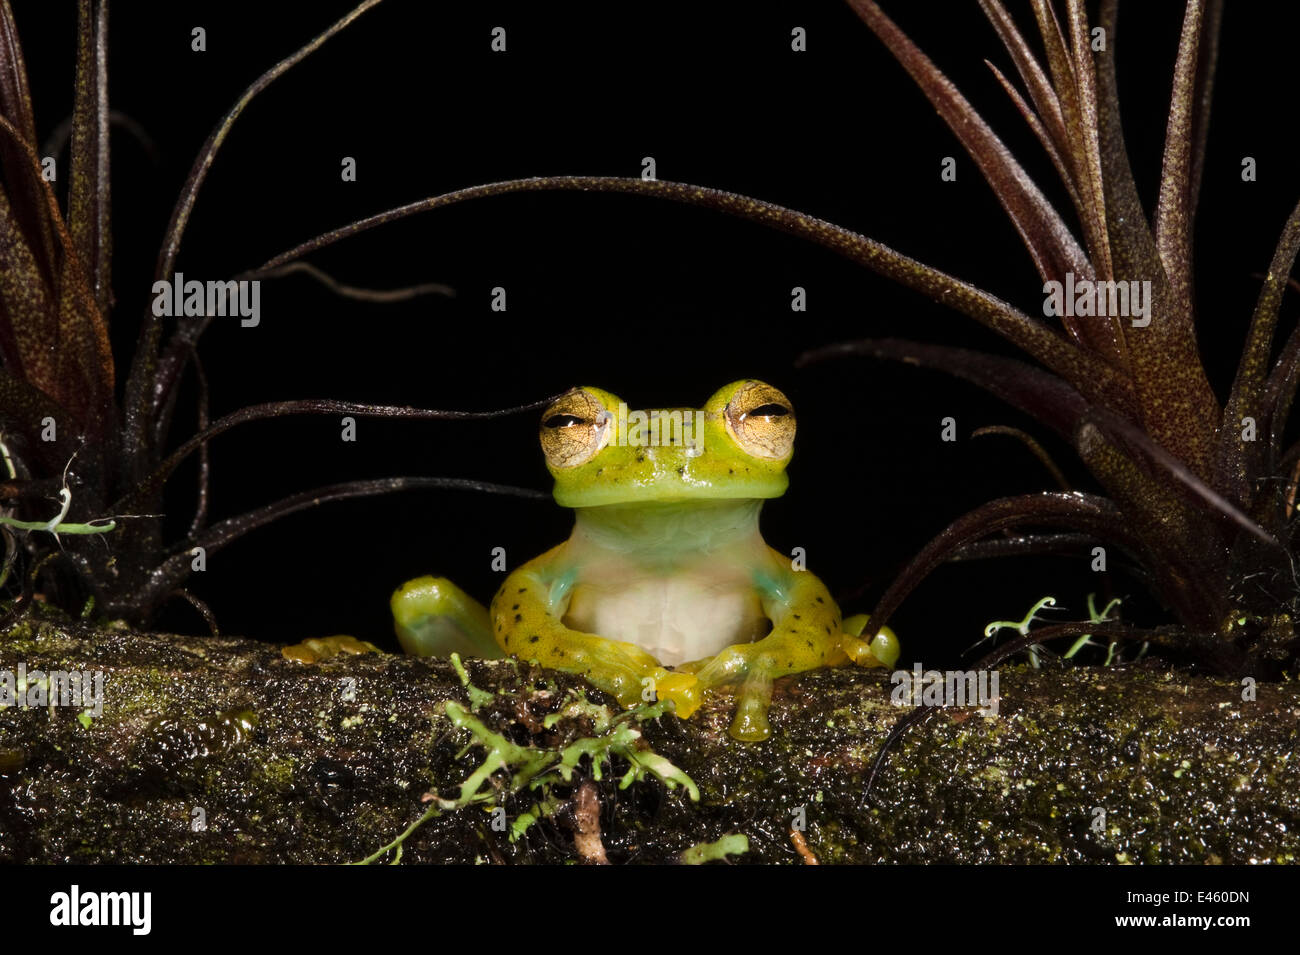 Portrait of an Emerald Glass Frog (Espadarana / Centrolenella prosoblepon). Captive. Chocó Region of northwest - Stock Image